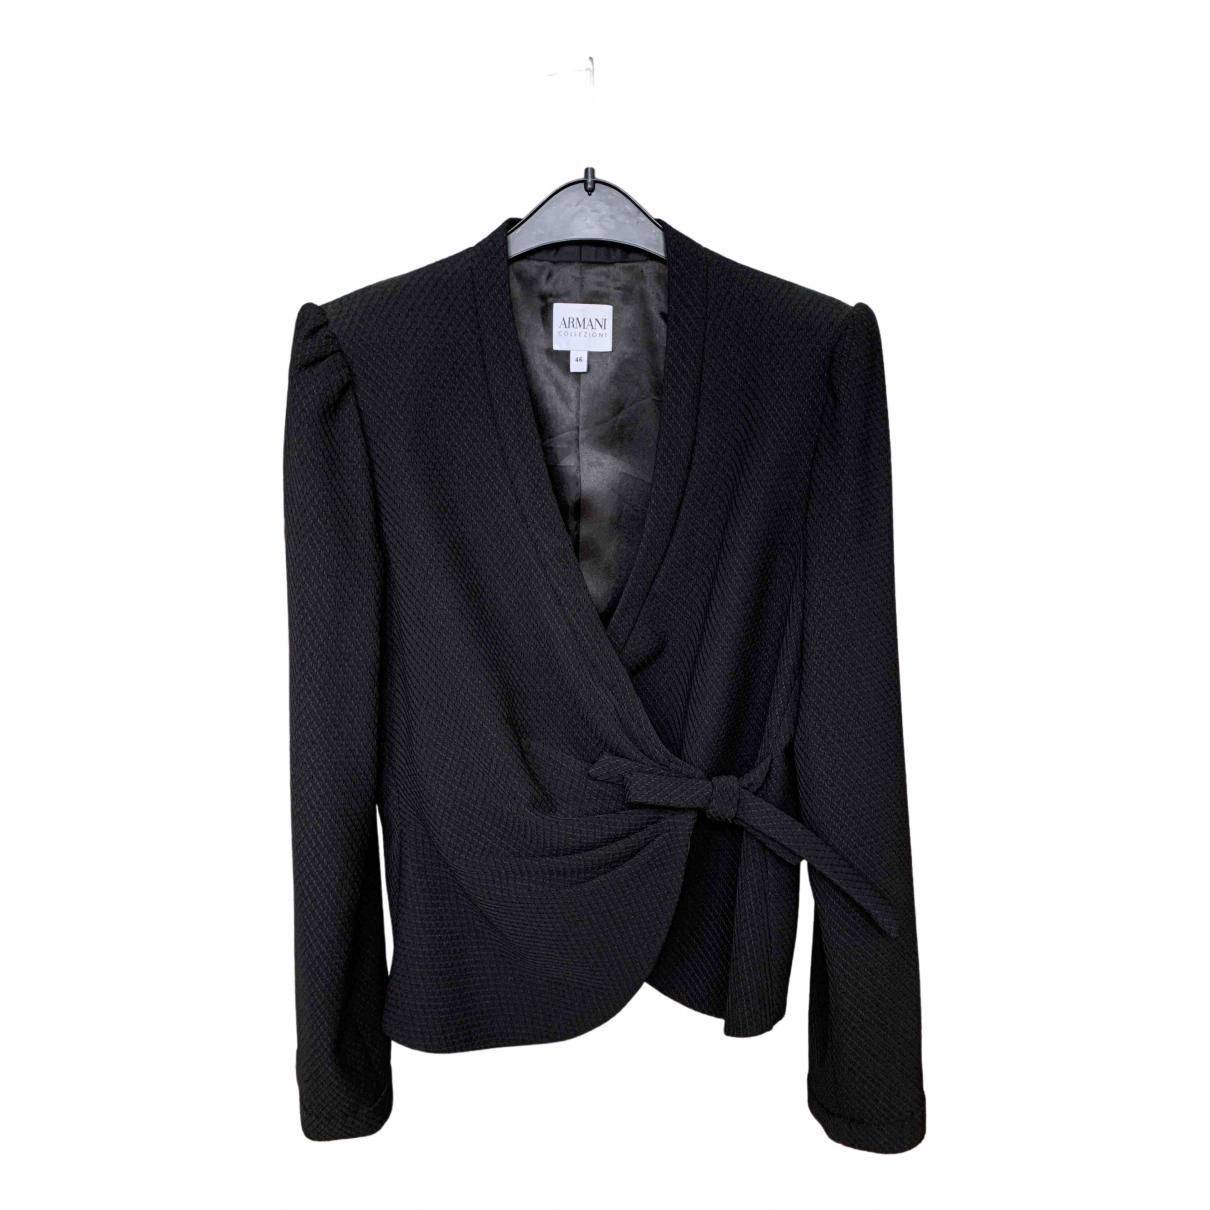 Armani Collezioni \N Black jacket for Women 46 FR